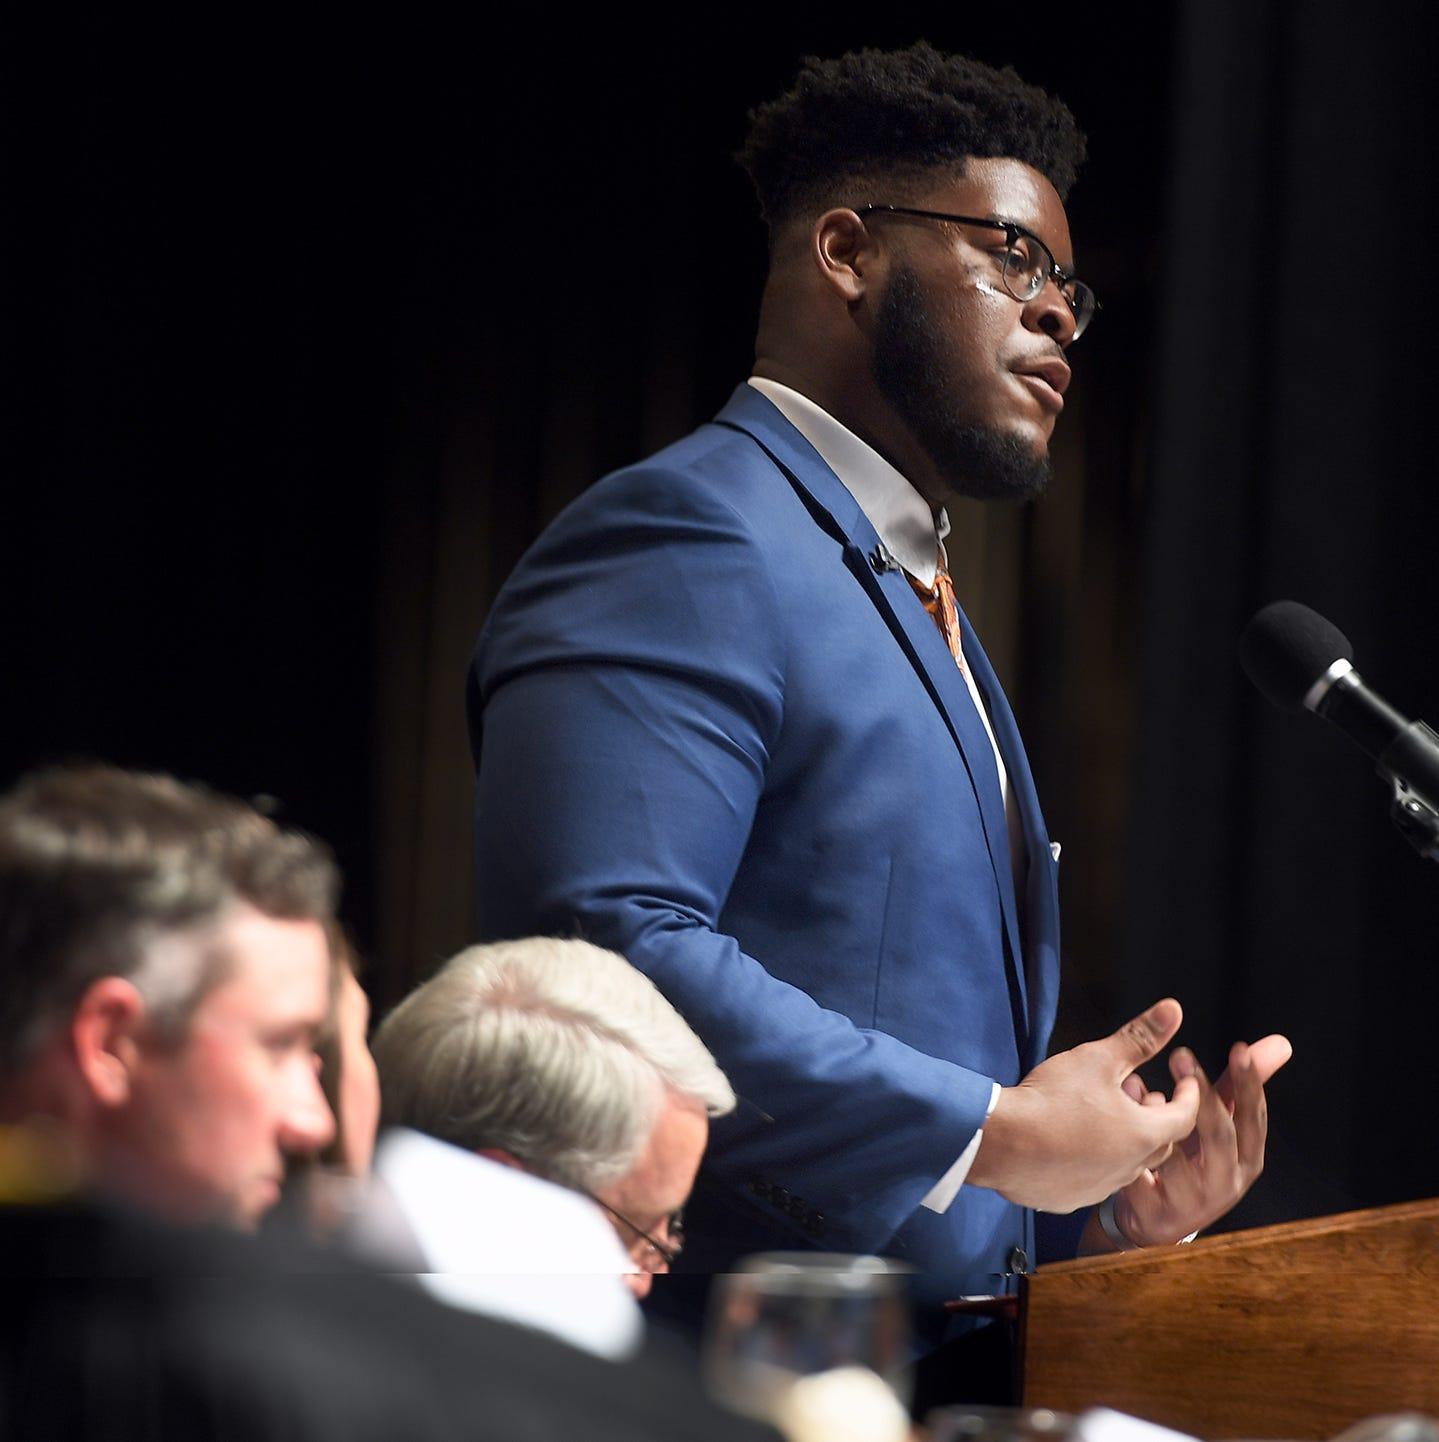 Tennessee football lineman, USJ grad Trey Smith, in limbo over health, speaks on inspiration